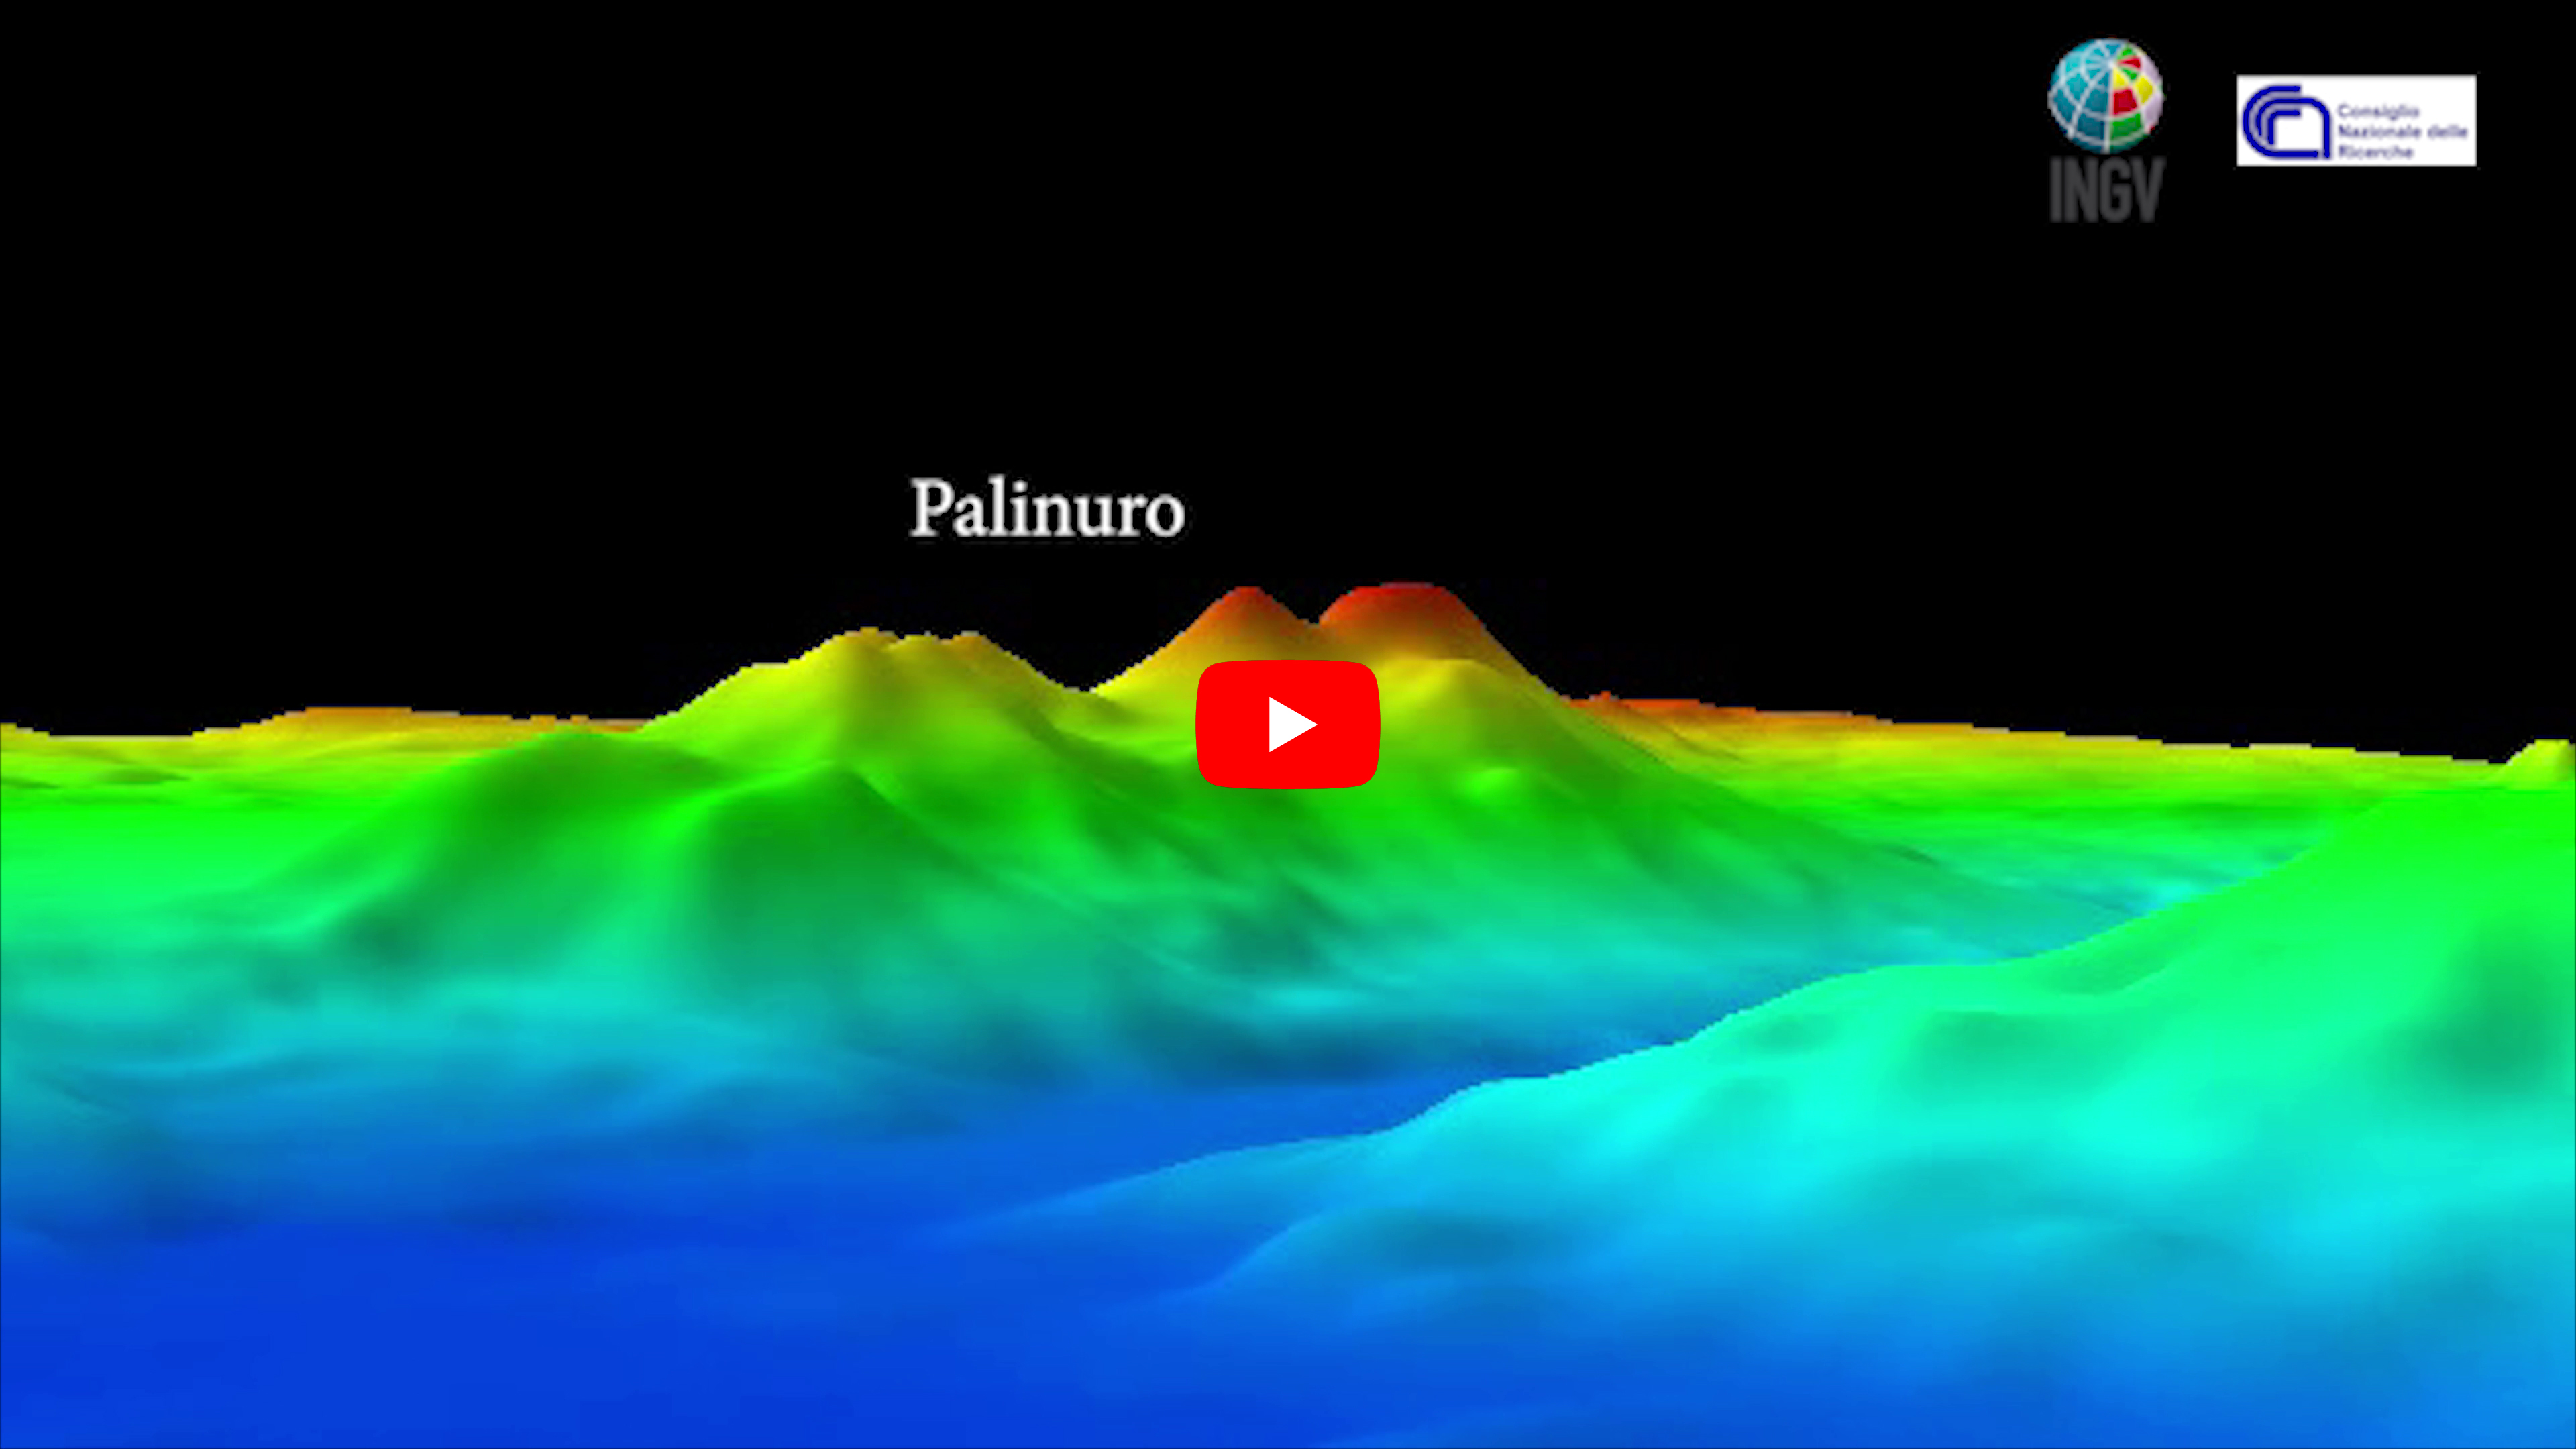 Una famiglia di vulcani nel Mar Tirreno – VIDEO INGV